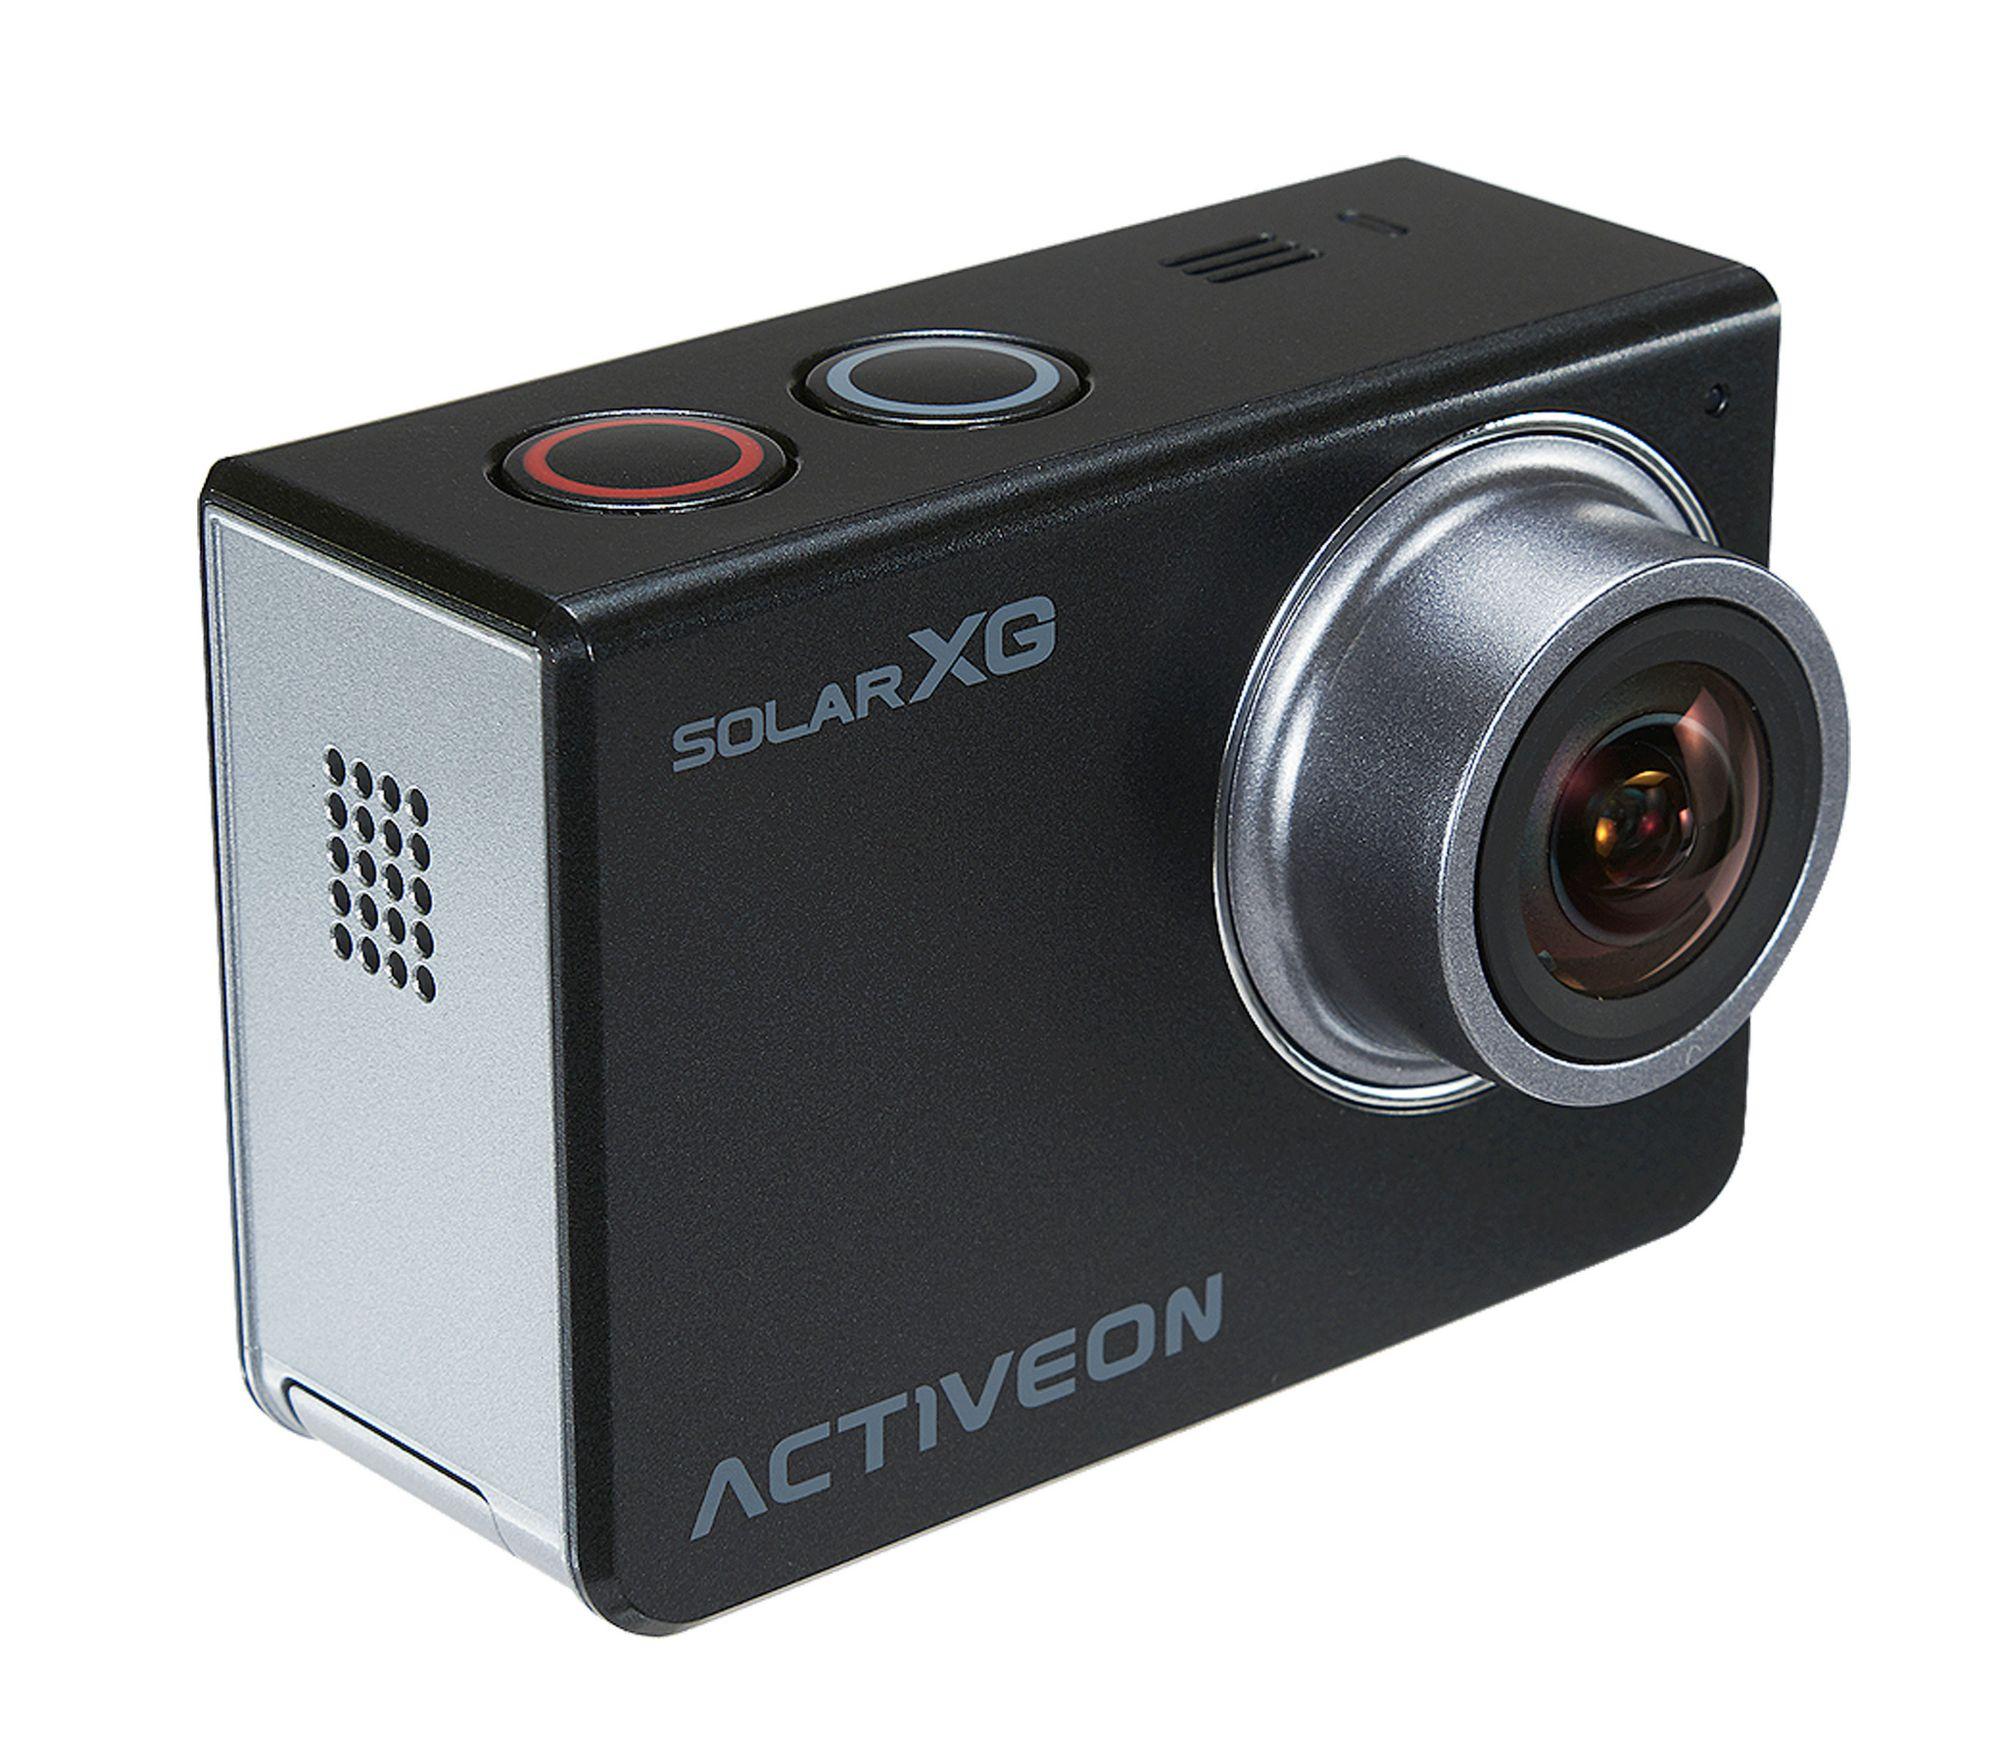 ACTIVEON  Digitale Kompaktkamera »SOLAR XG XCA10W«